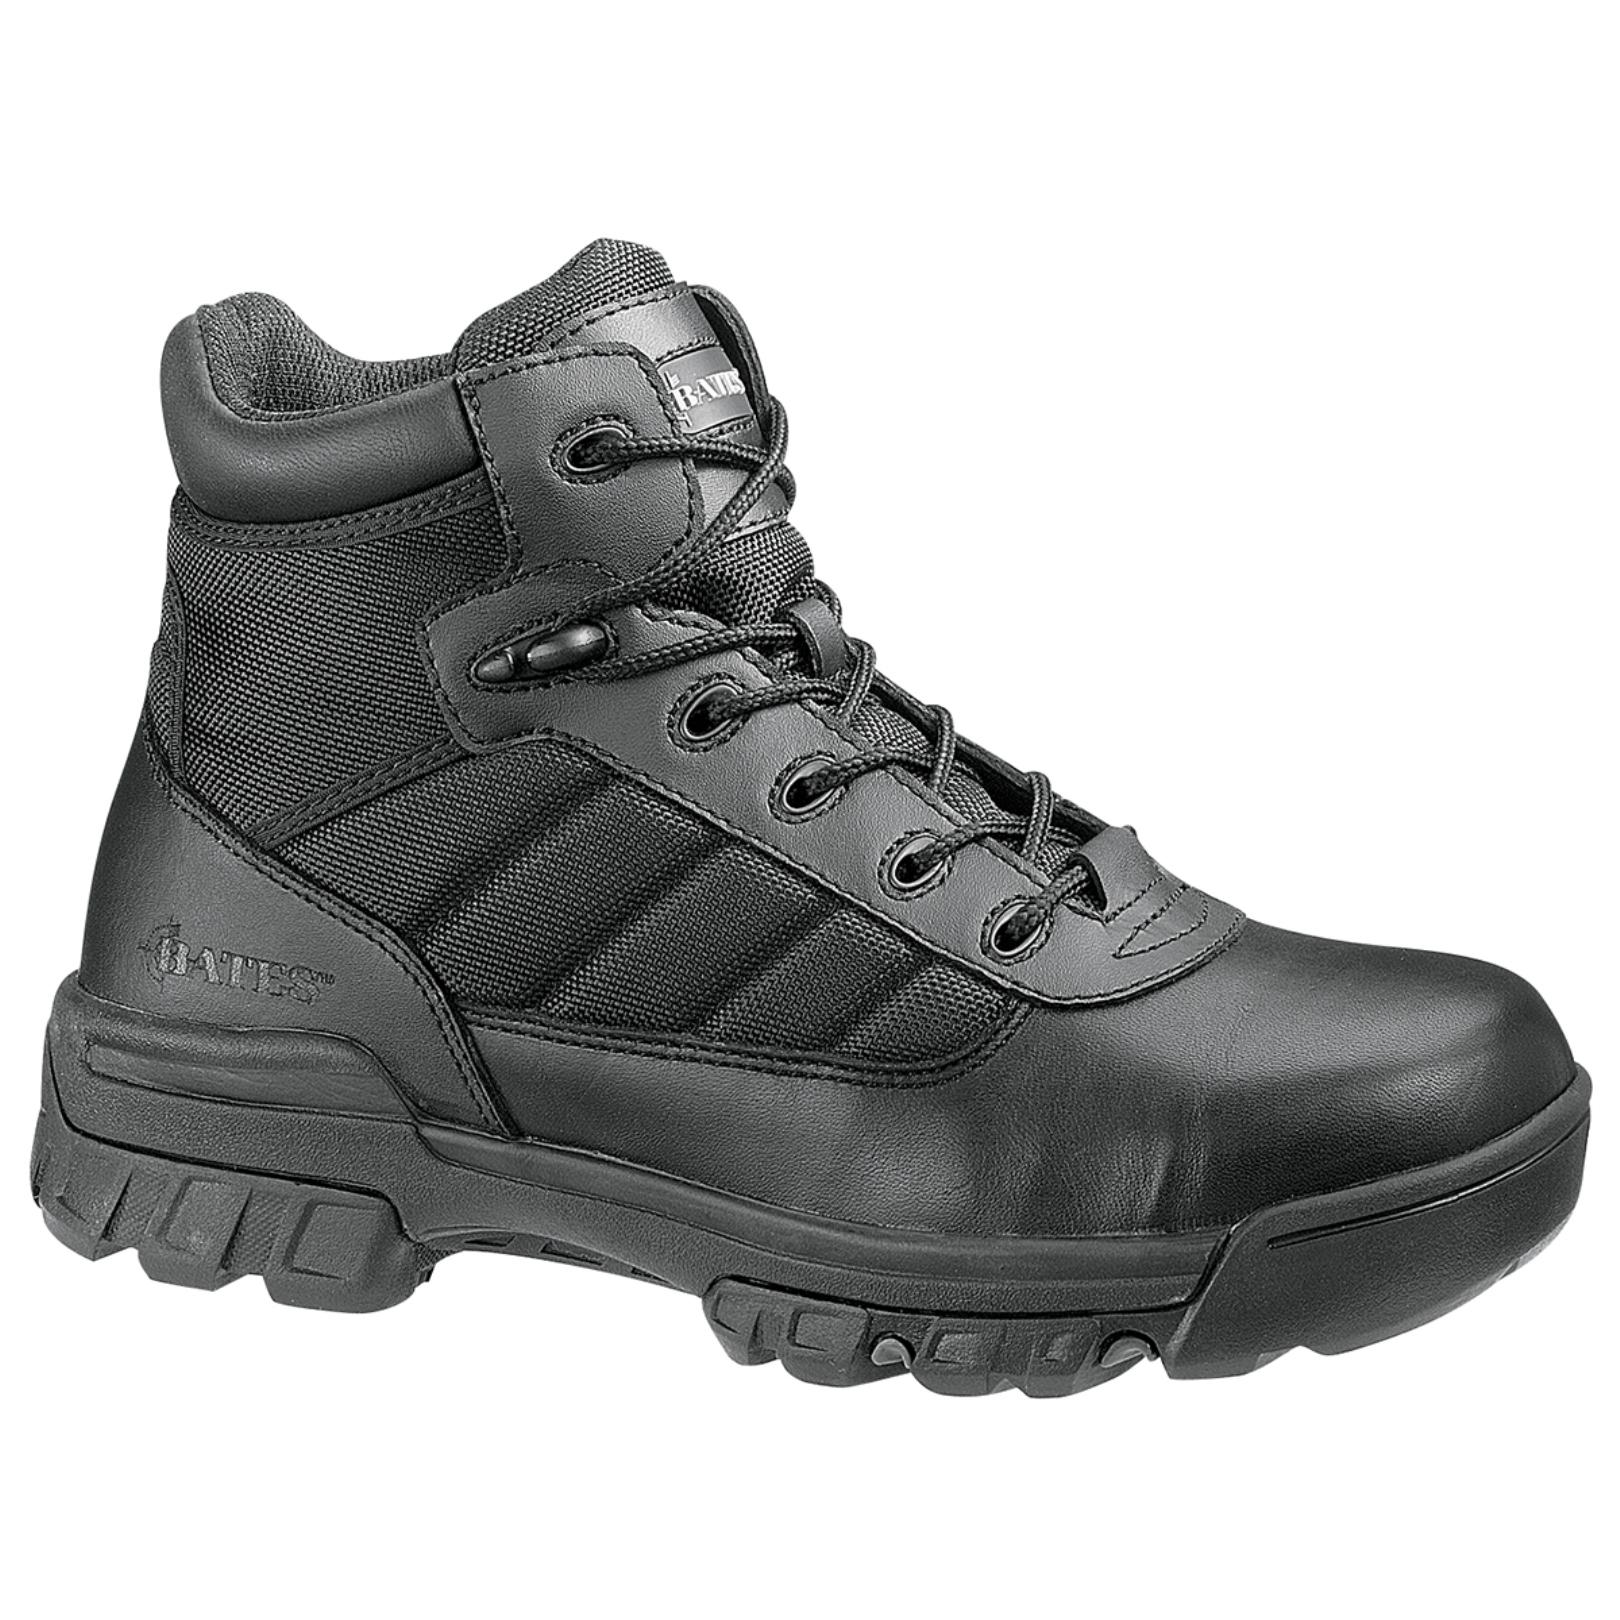 "Bates Men's Ultra-Lites 5"" Soft Toe Work Boot E02262 Wide ..."